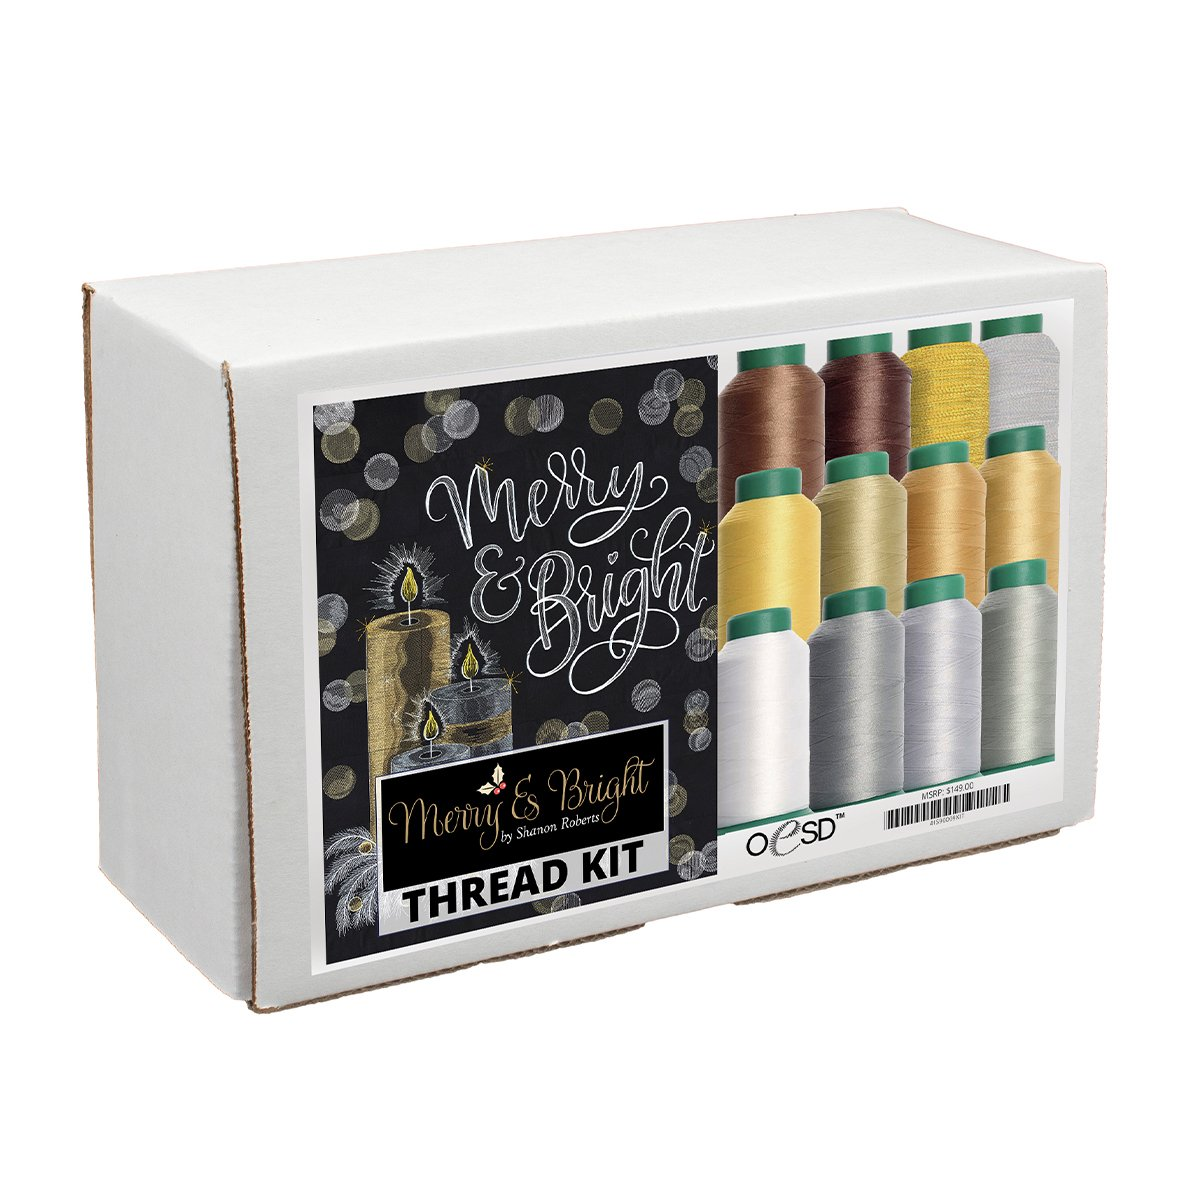 Merry & Bright White & Gold Thread Kit